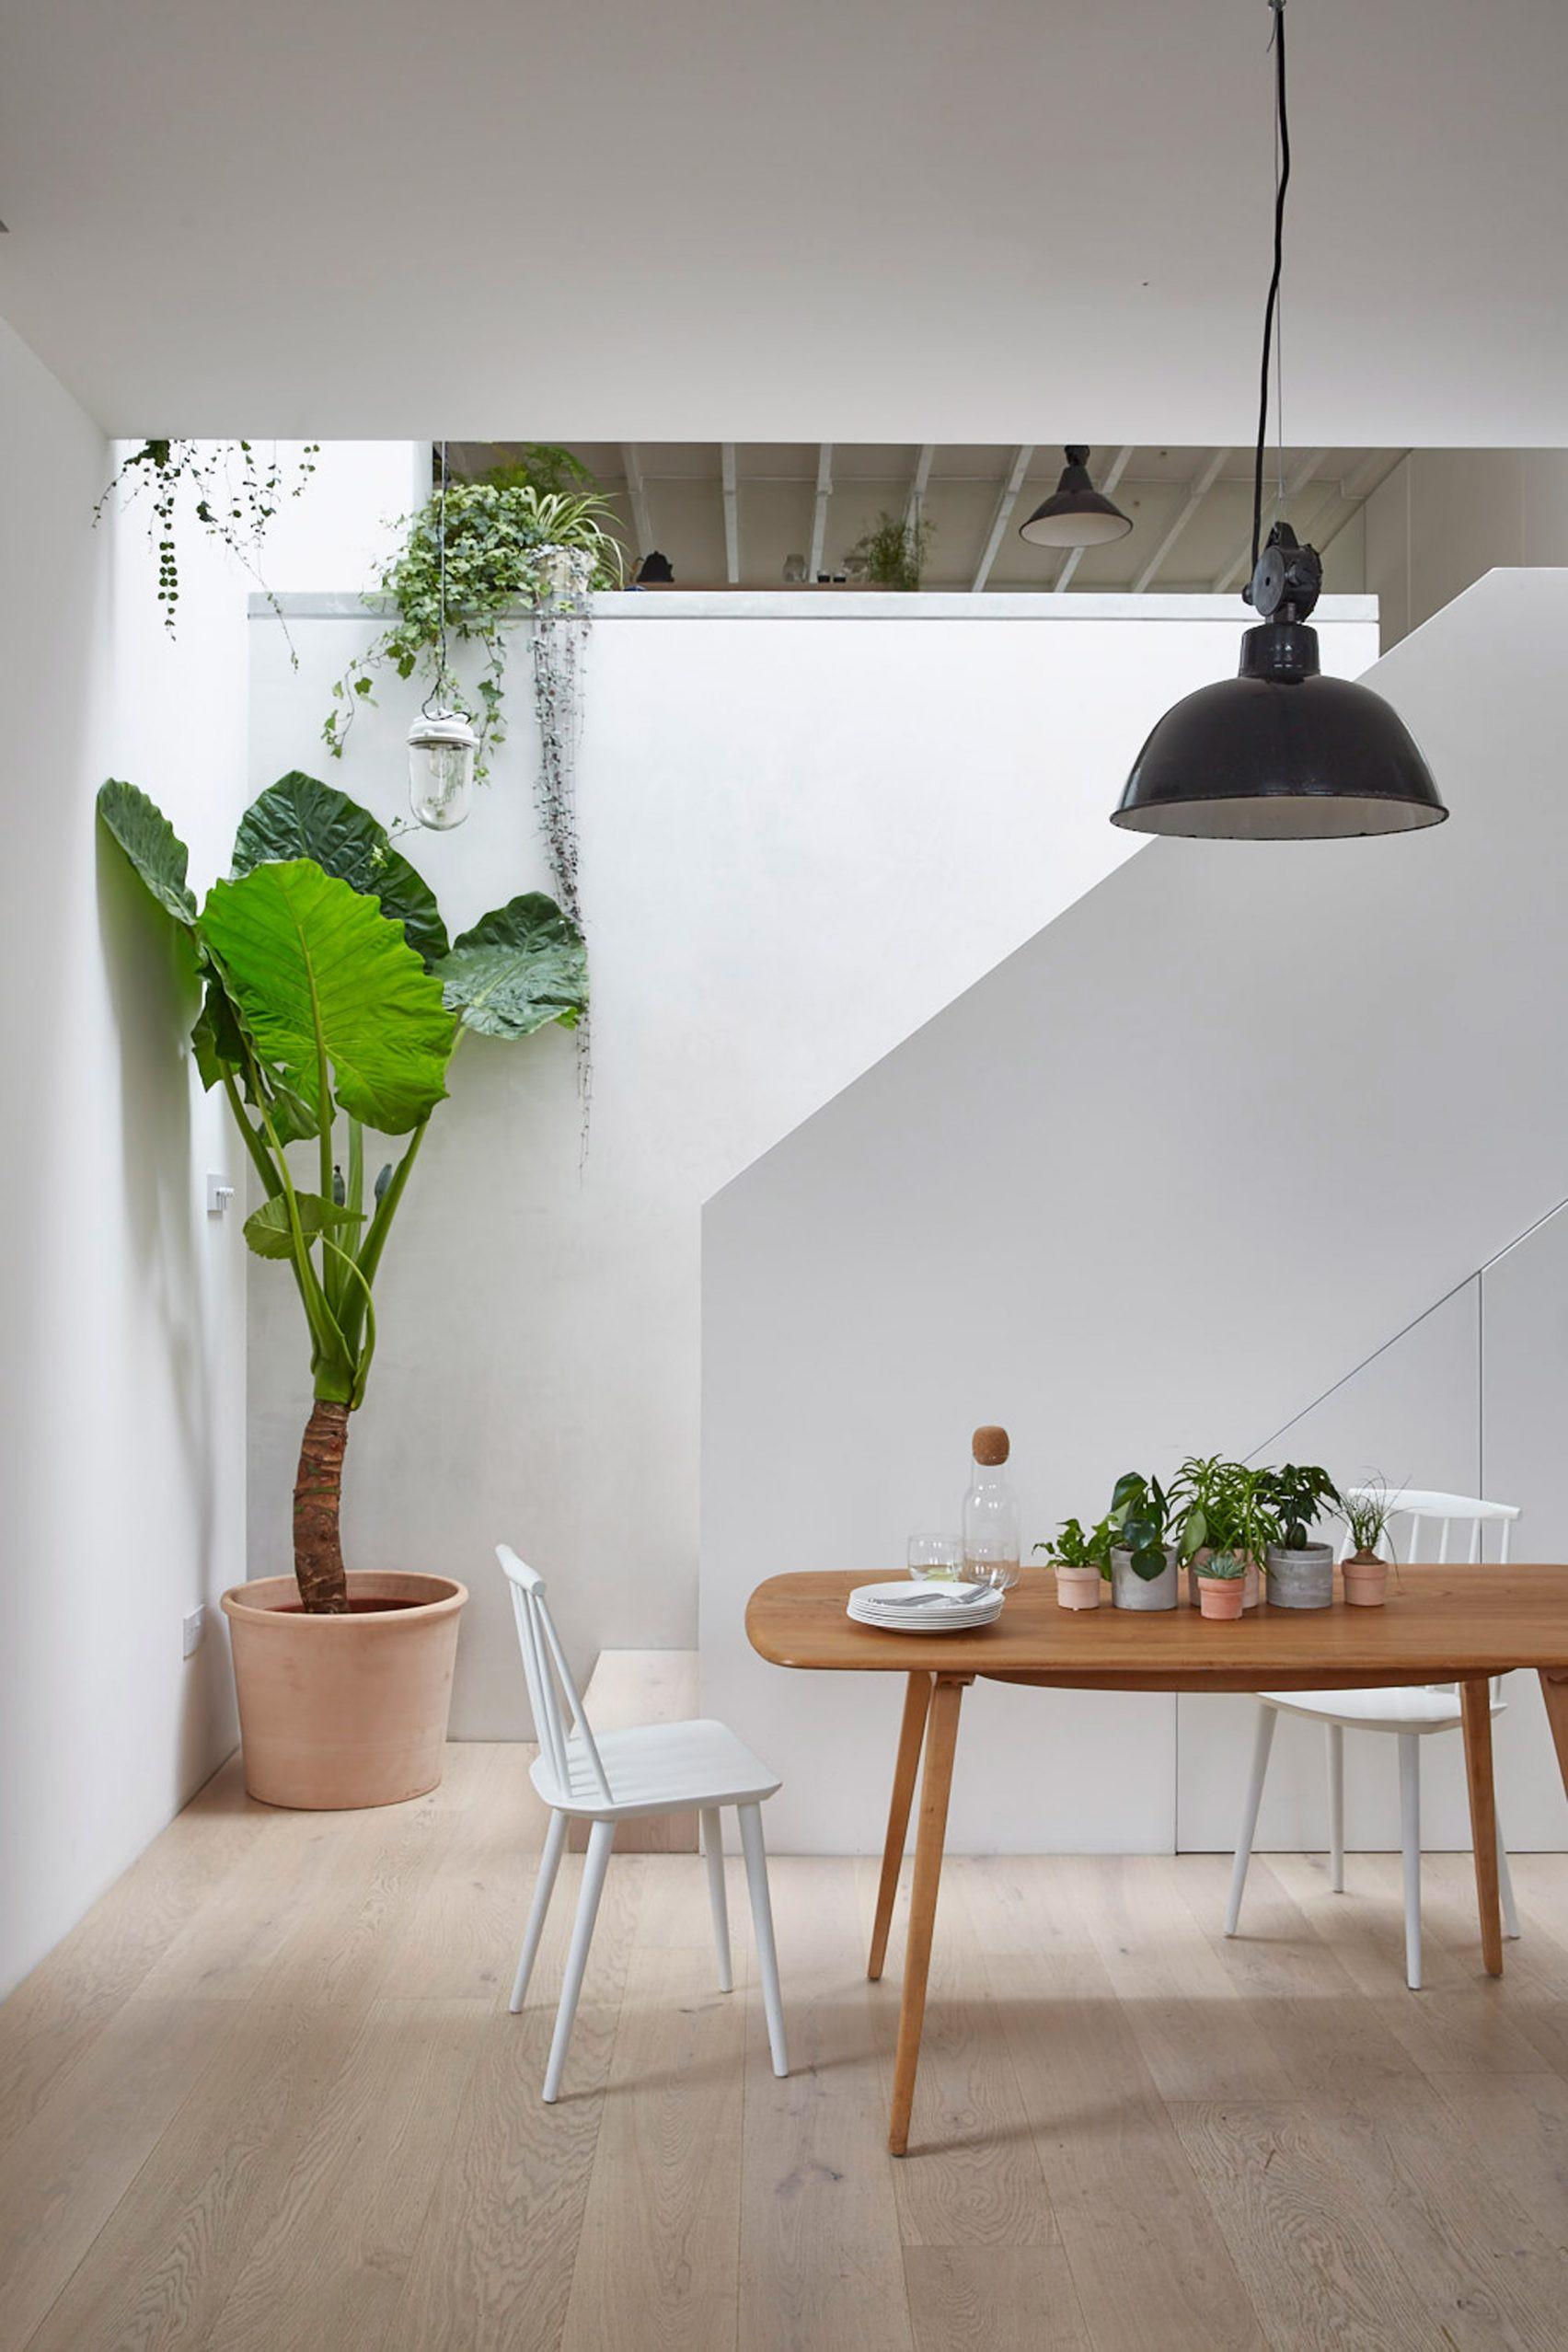 hackney-mews-hutch-design-london-architecture-_dezeen_2364_col_3-1704x2556